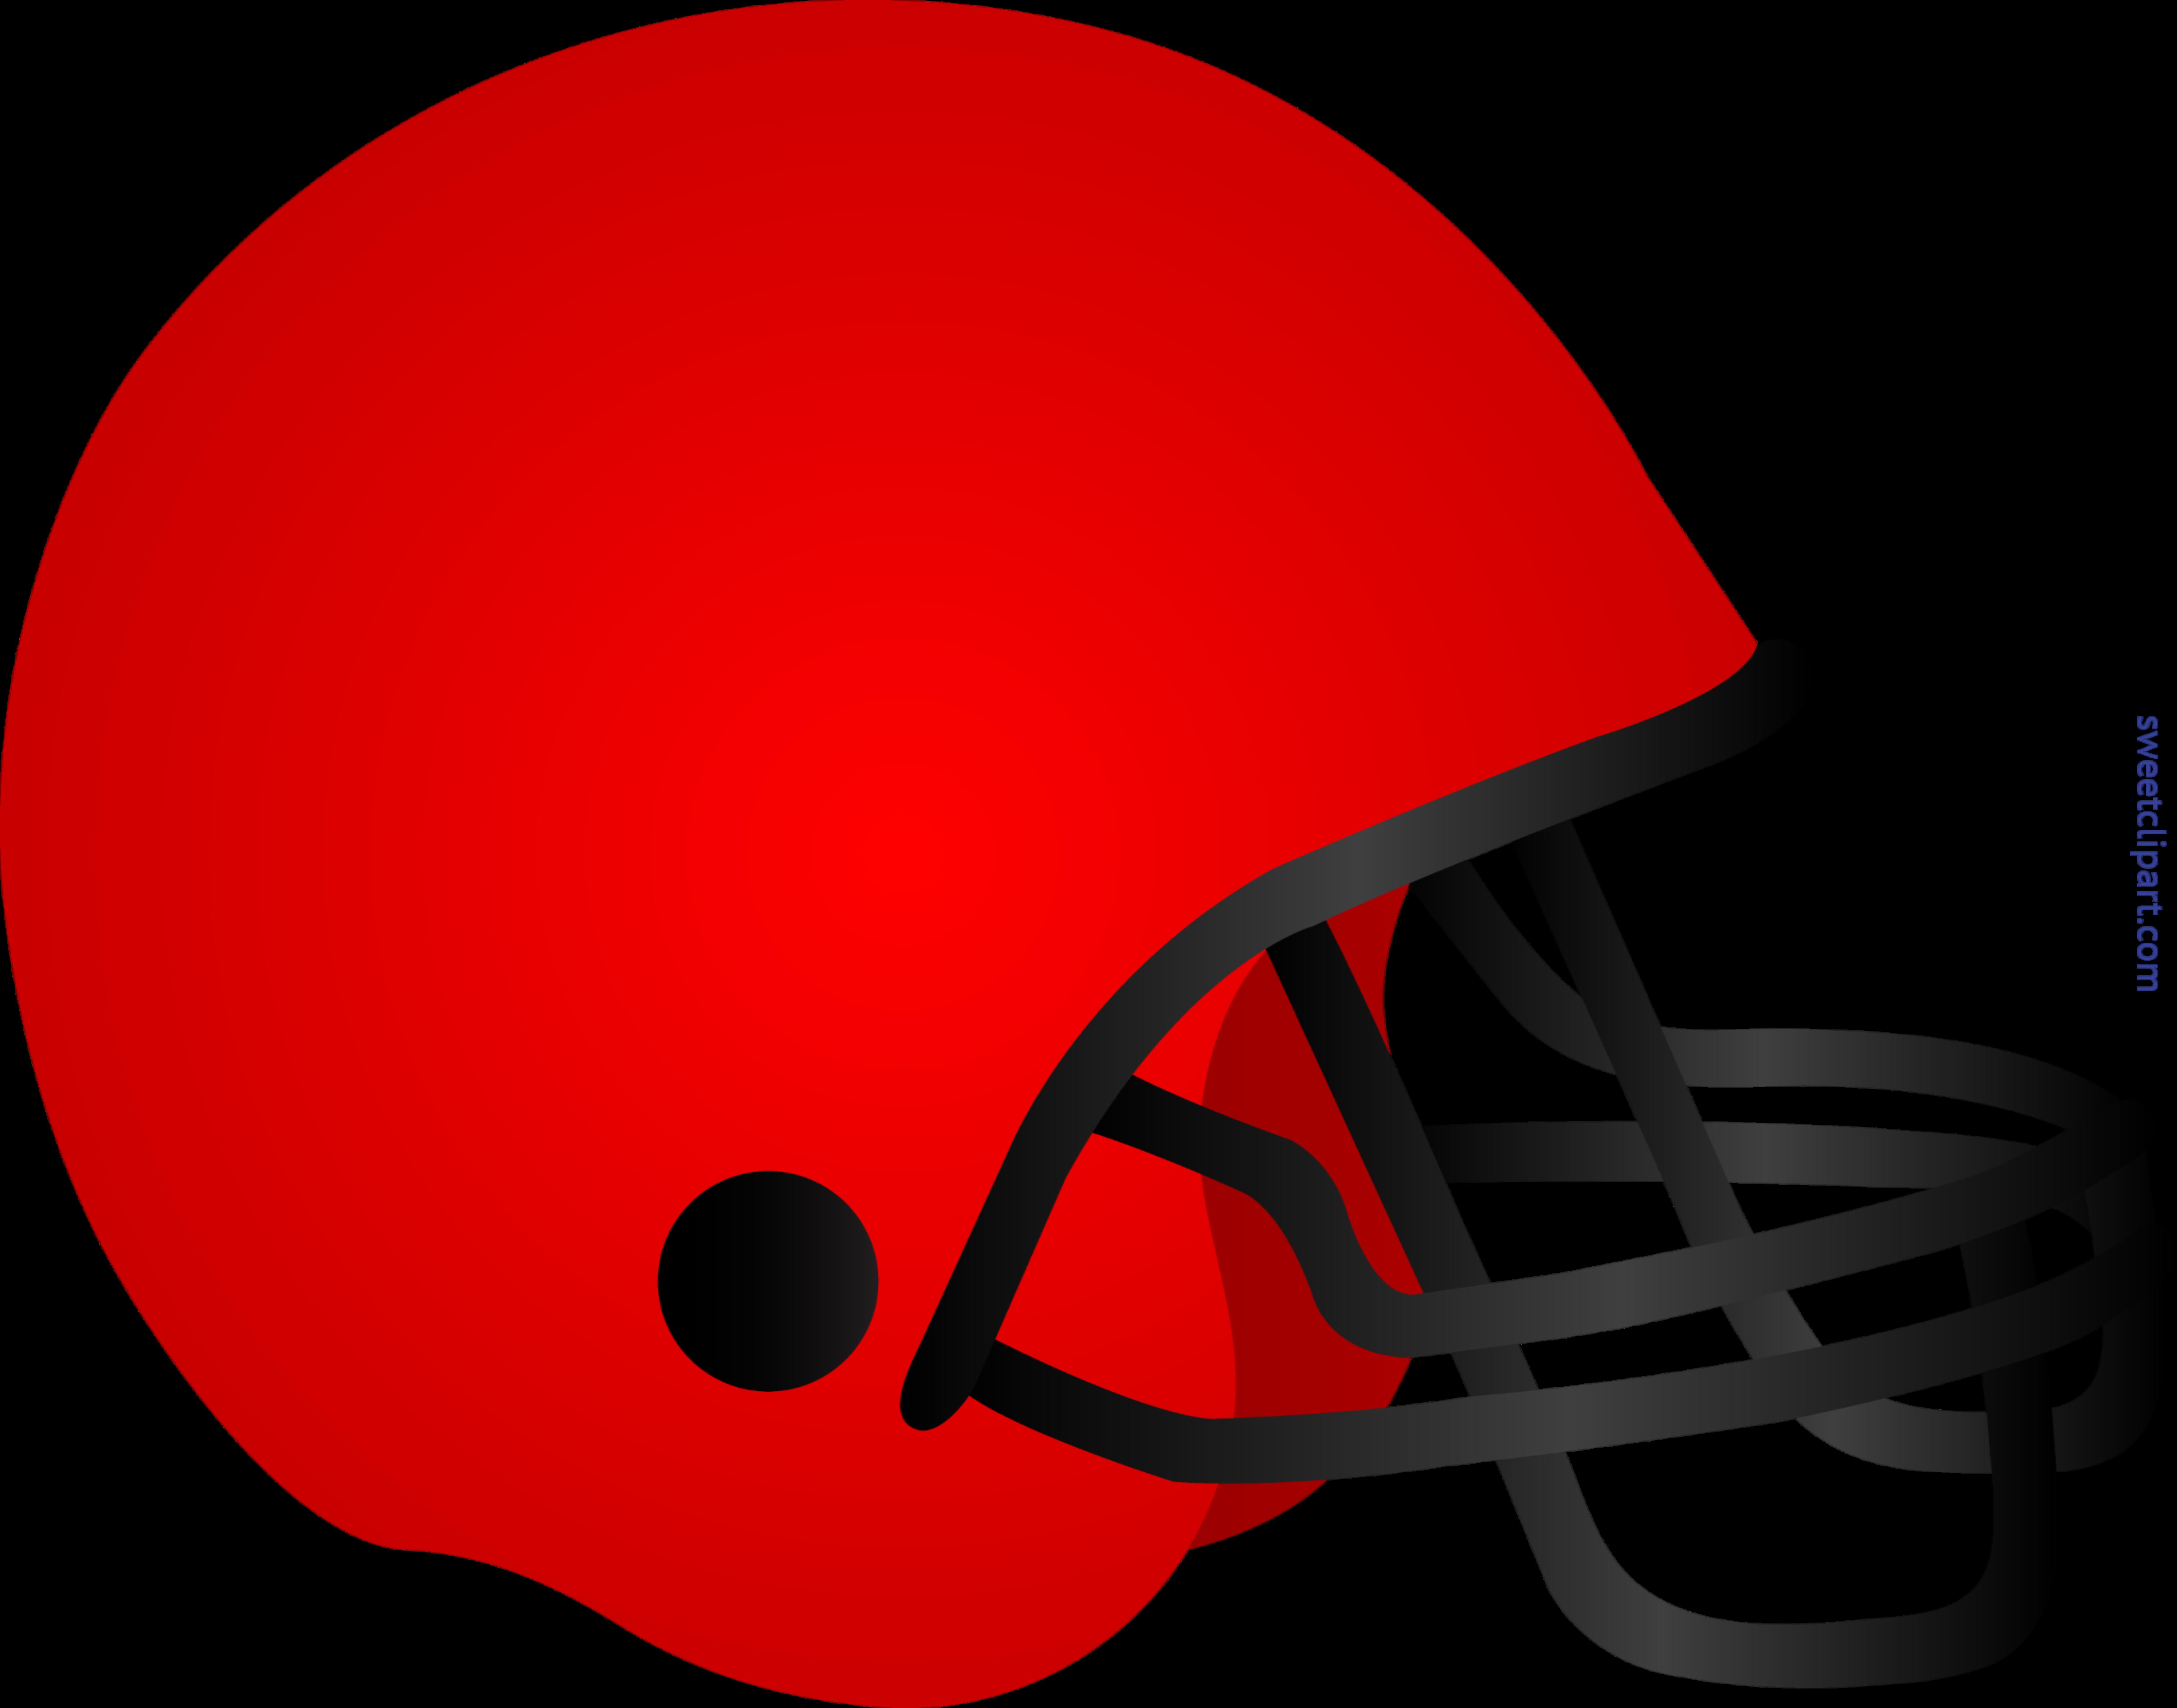 svg royalty free download Football Helmet Red Clip Art